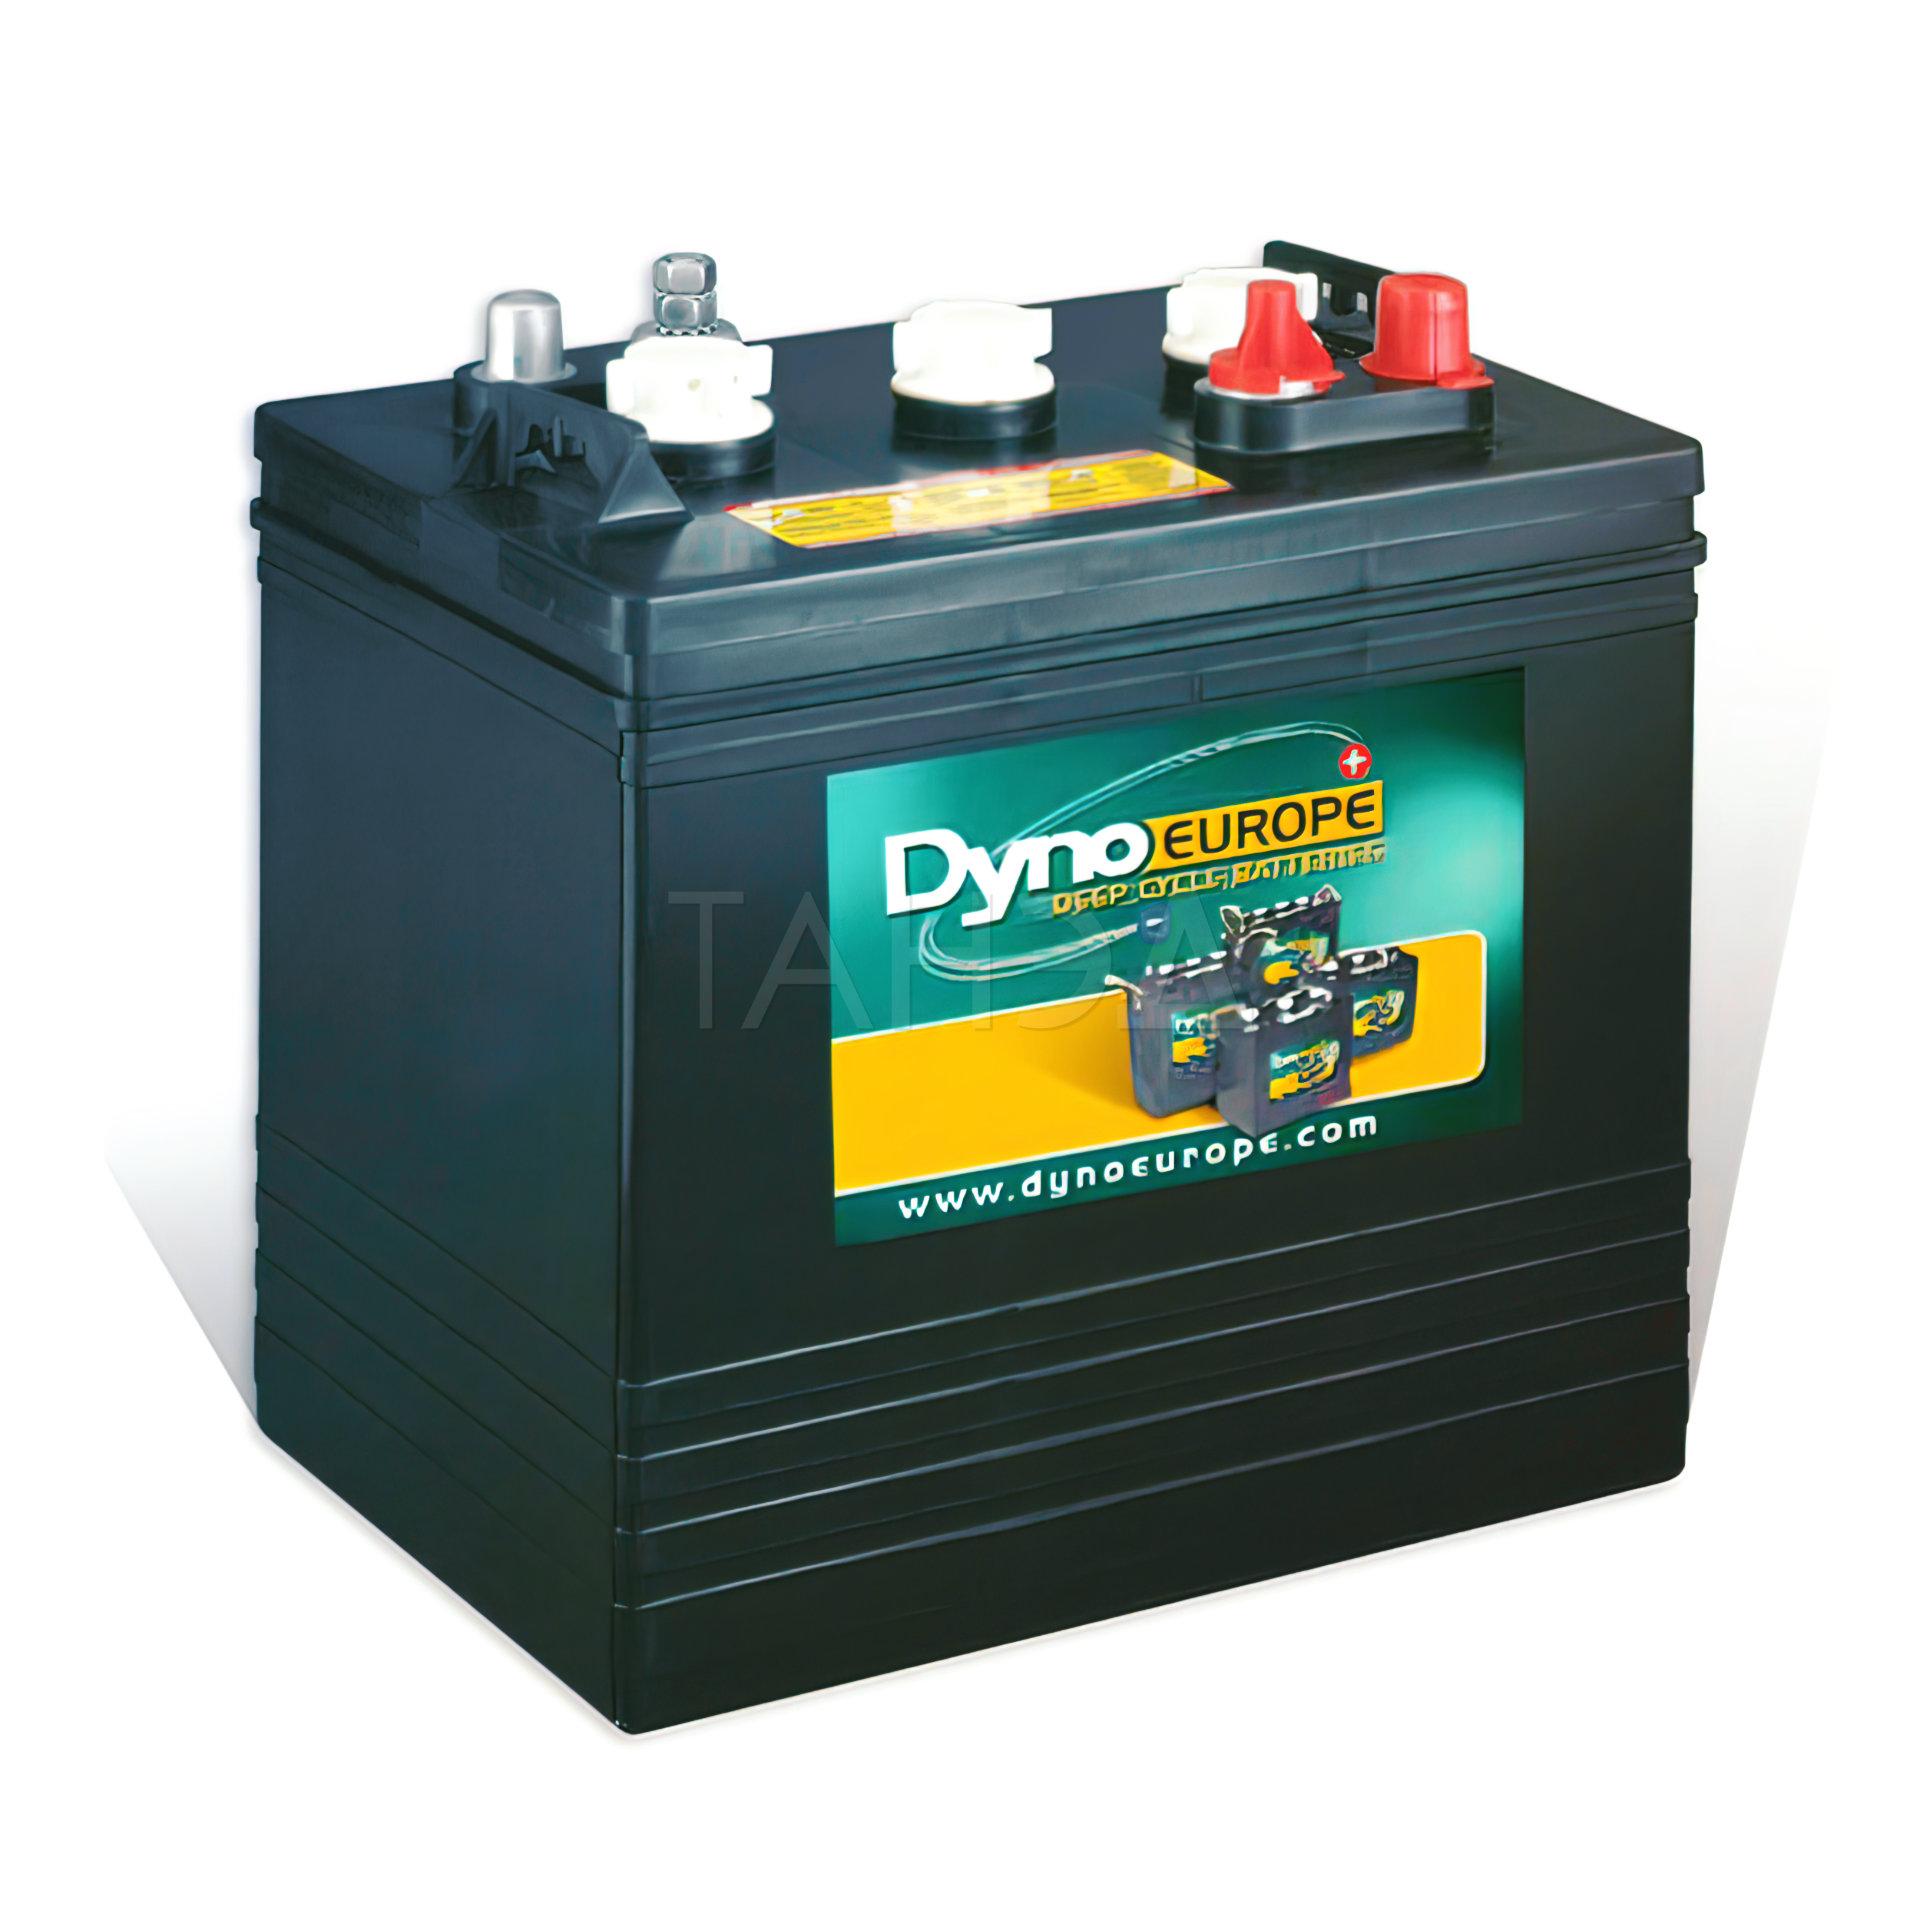 Тяговый аккумулятор GC2B-HD